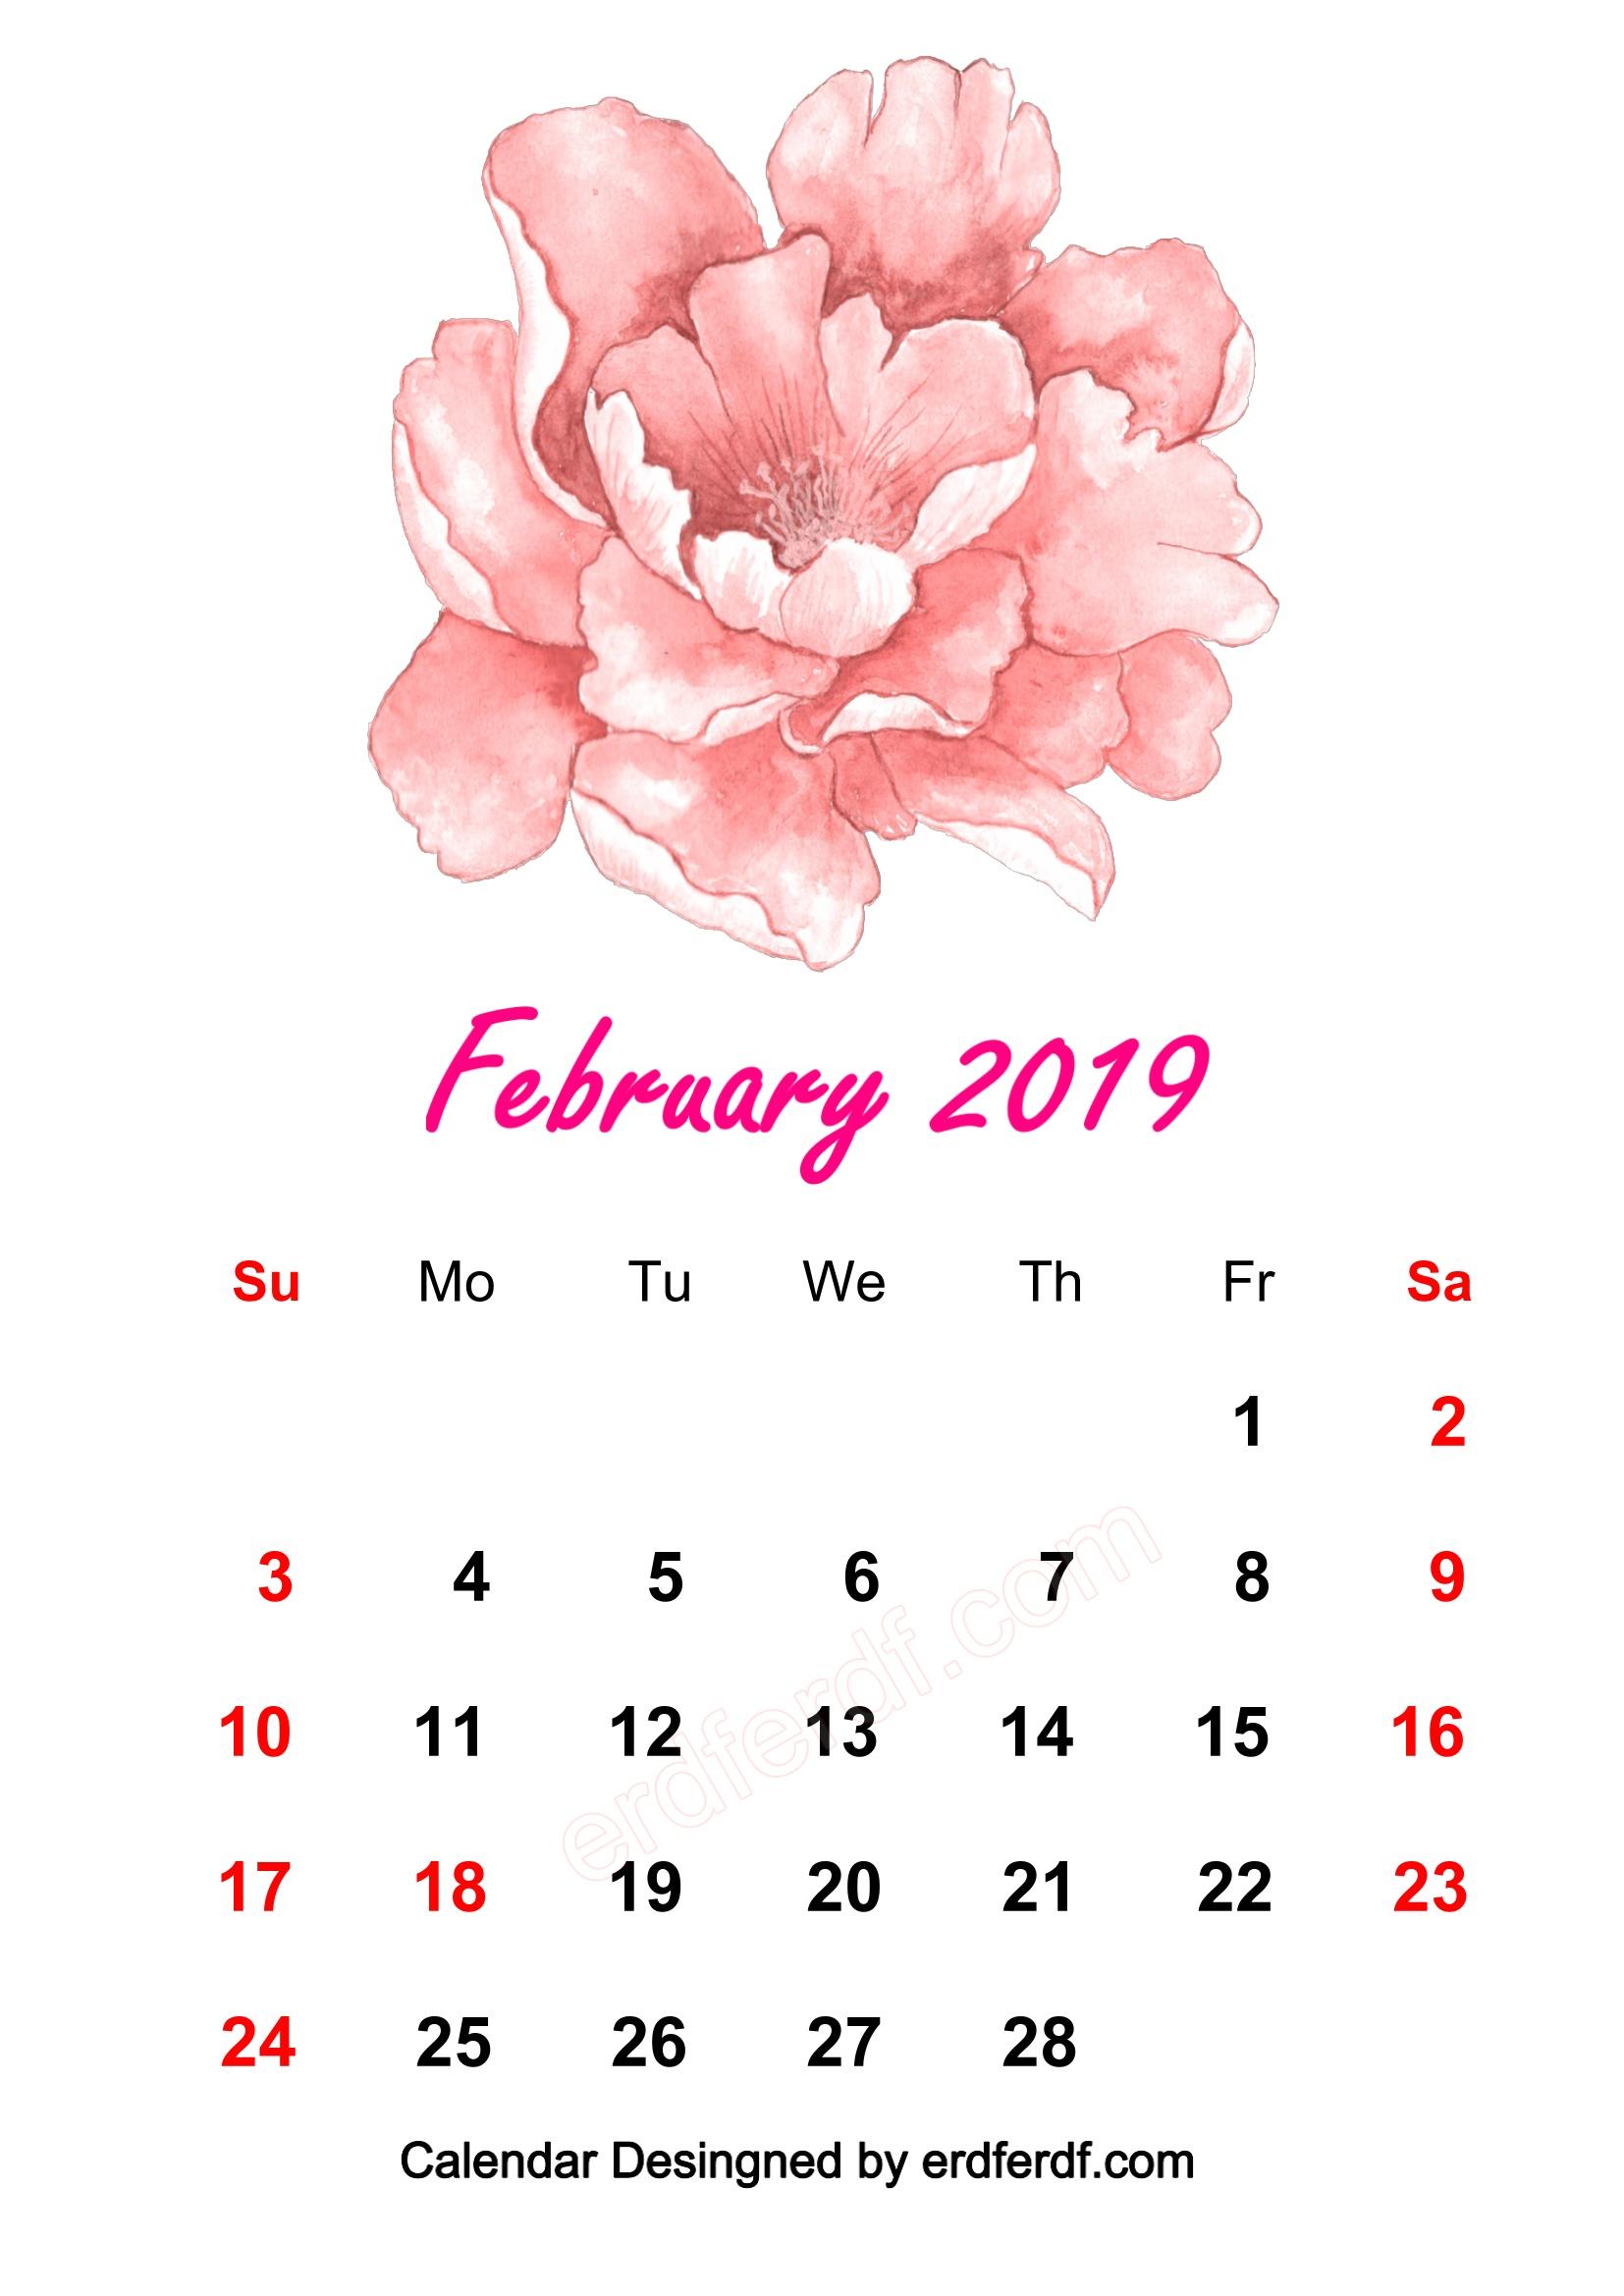 3 February 2019 HD Calendar Wallpapers